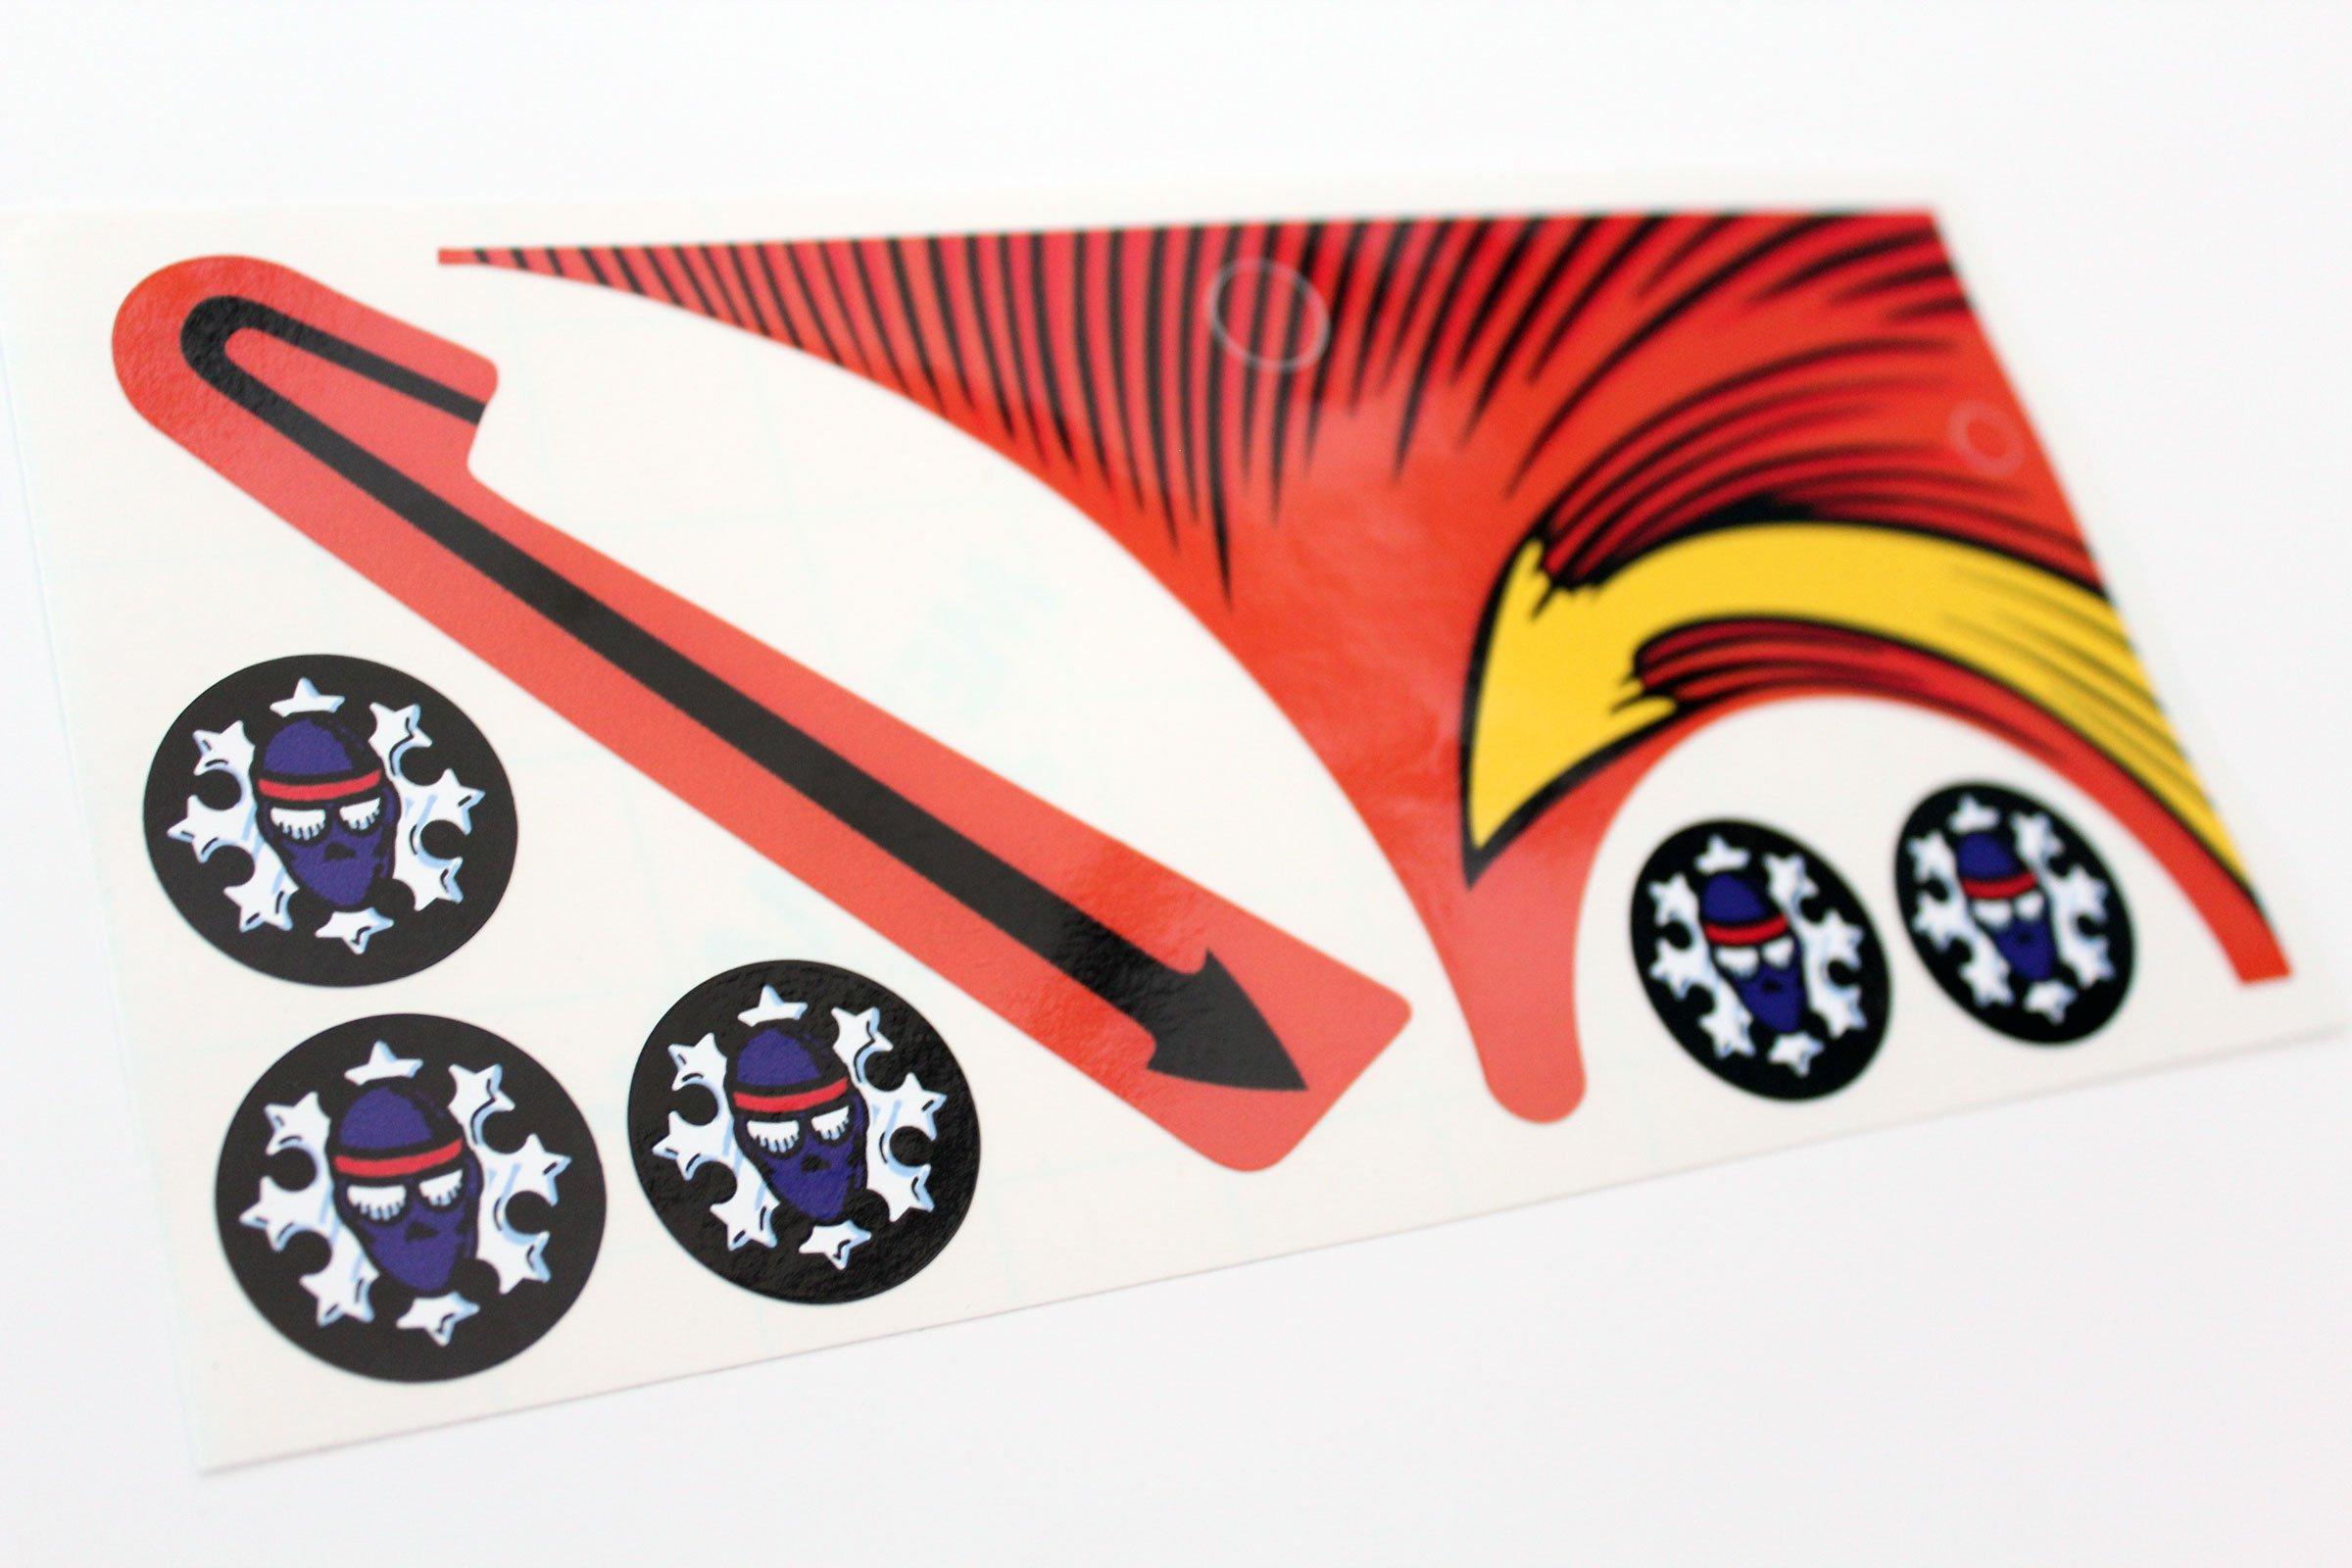 Teenage Mutant Ninja Turtles Pinball Ramp Top Bumper Decals Stickers 03